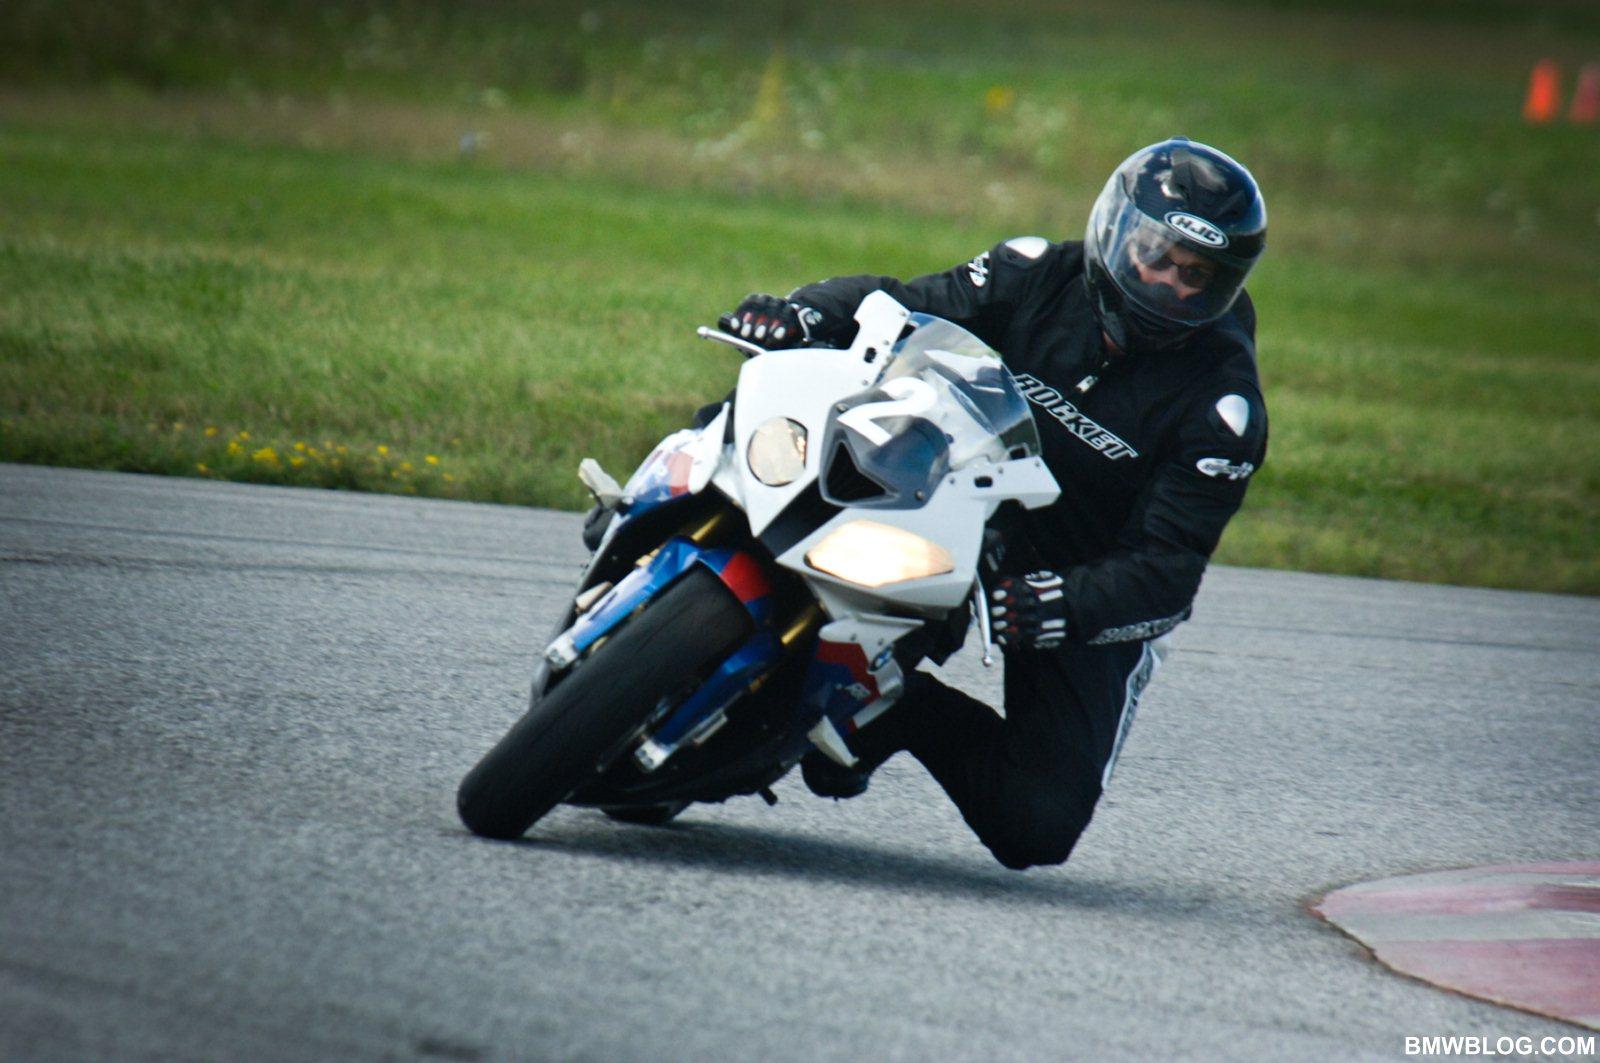 bmwblog ride review bmw s1000rr  a knee sliding good time